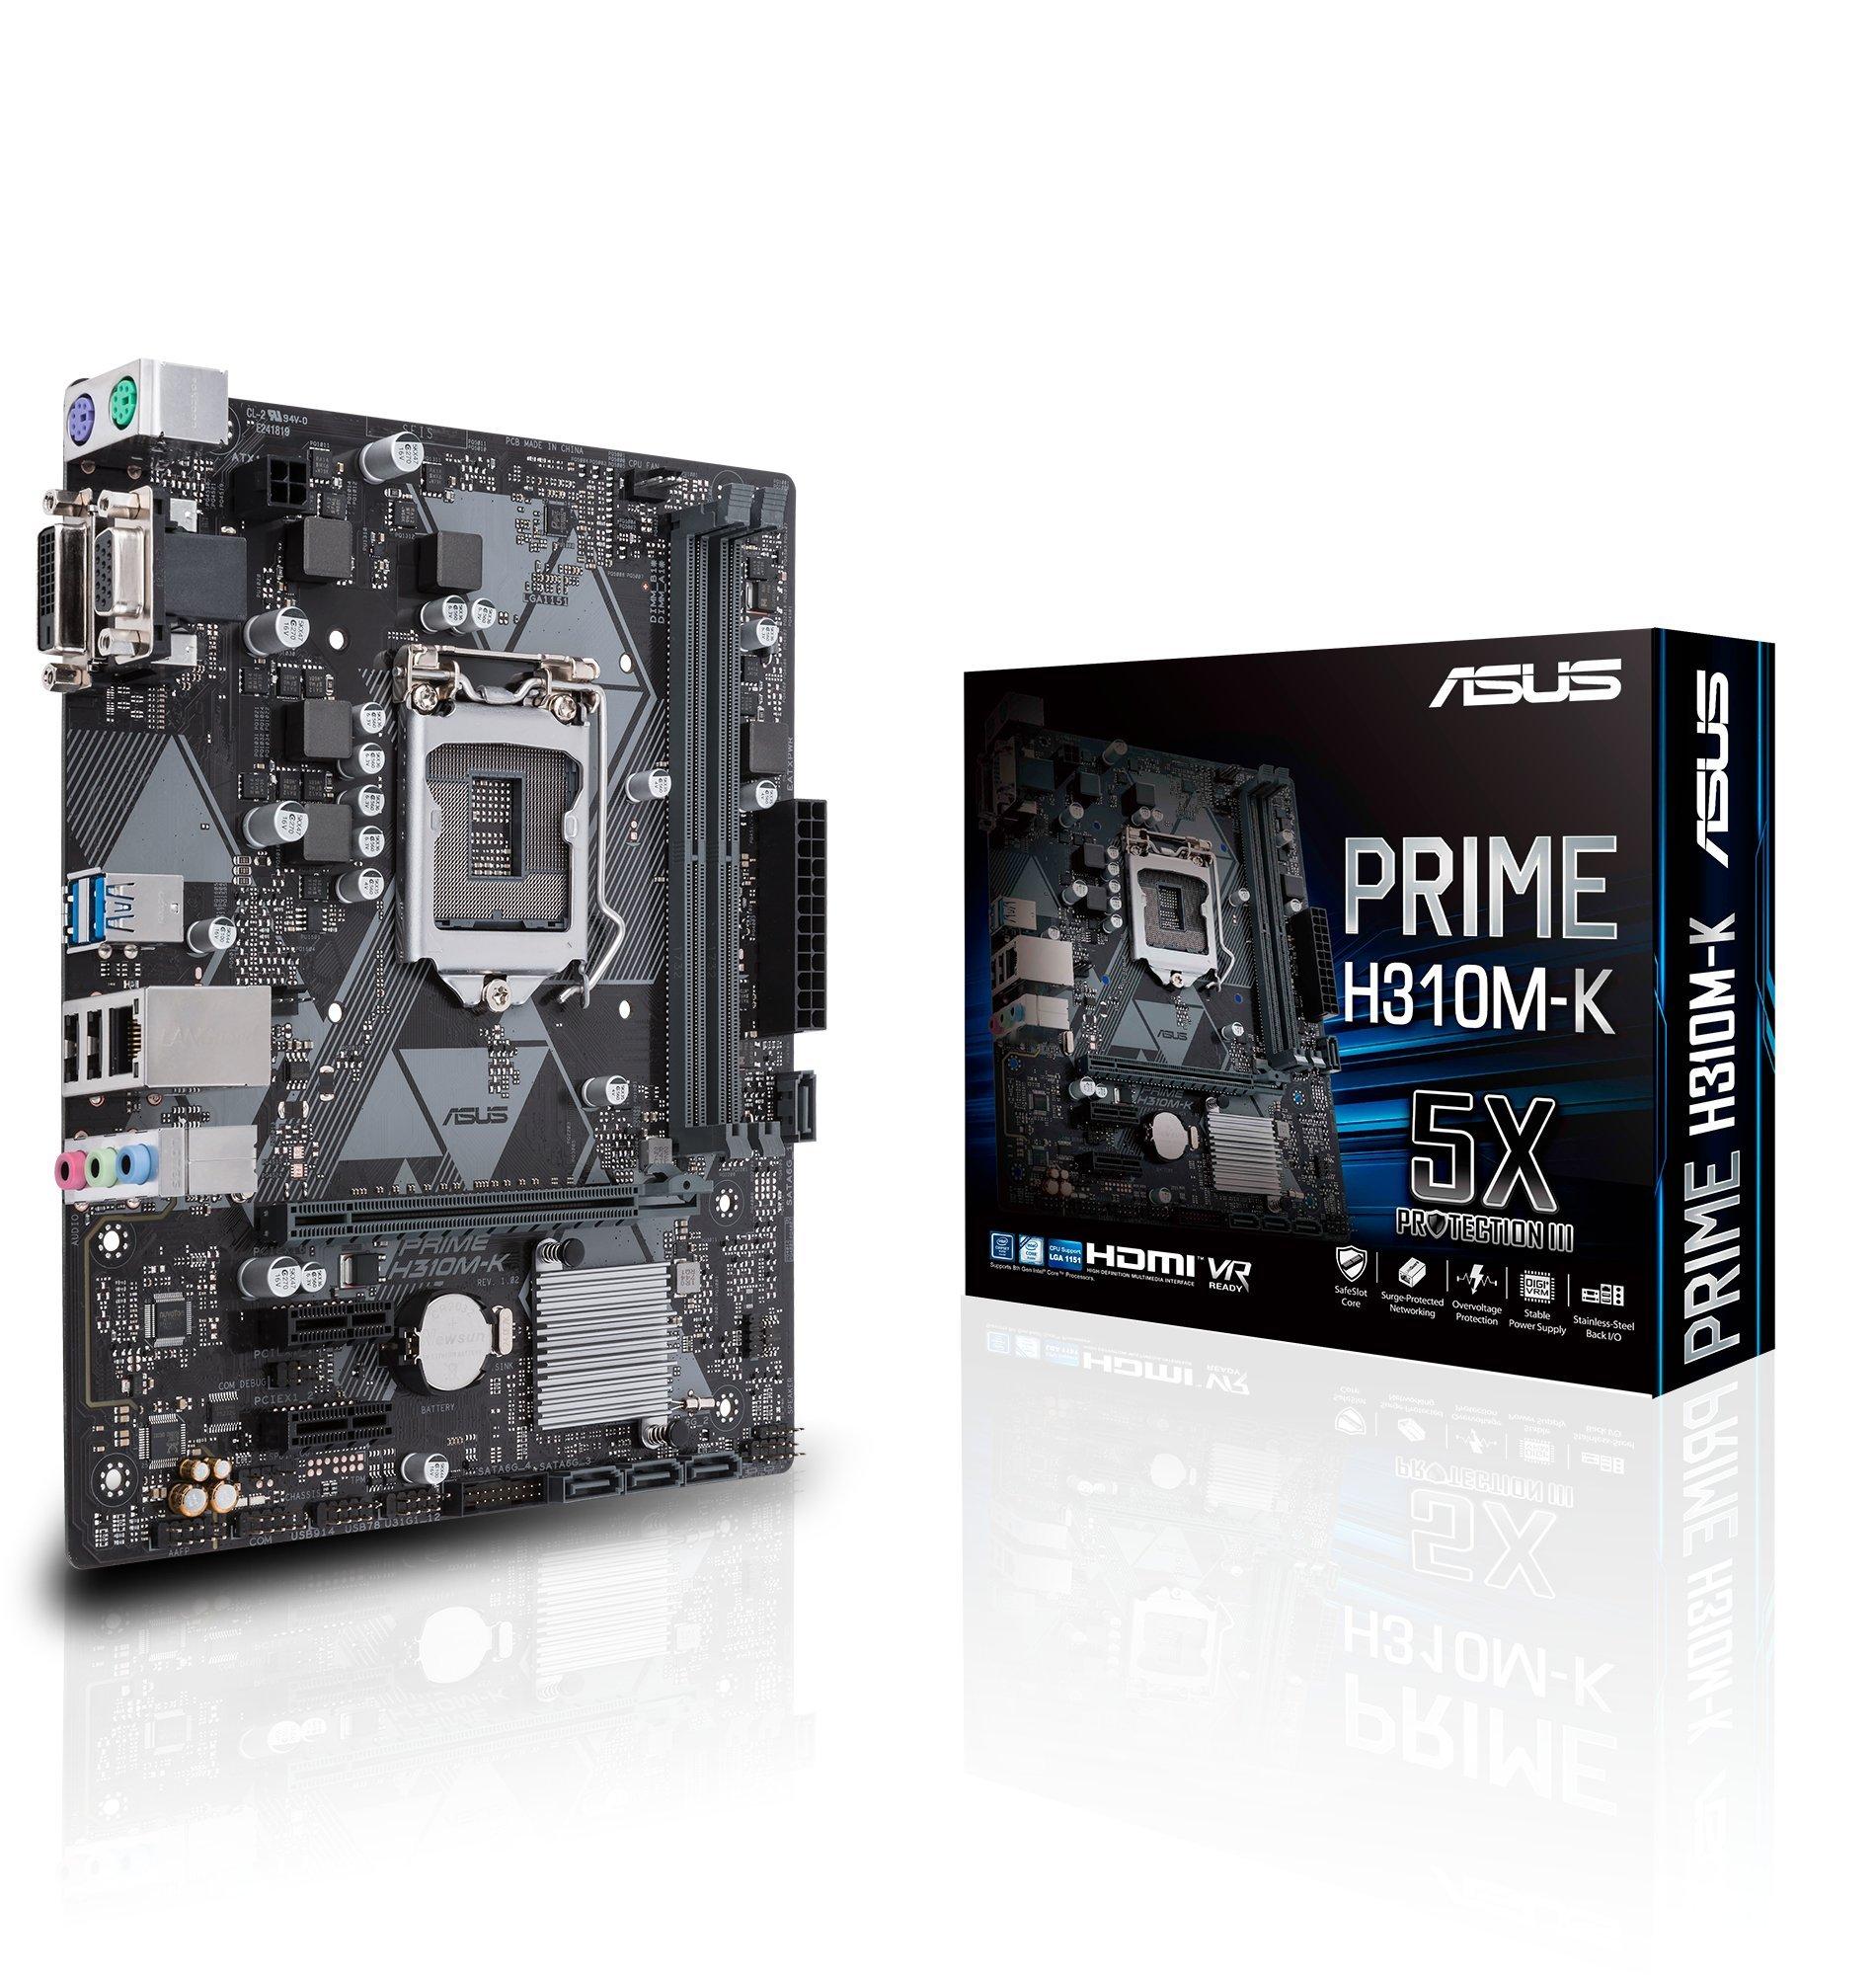 ASUS Prime H310M-K LGA1151 (Intel 8th Gen) DDR4 VGA DVI H310 Micro ATX Motherboard Model 90MB0X80-M0AAY0